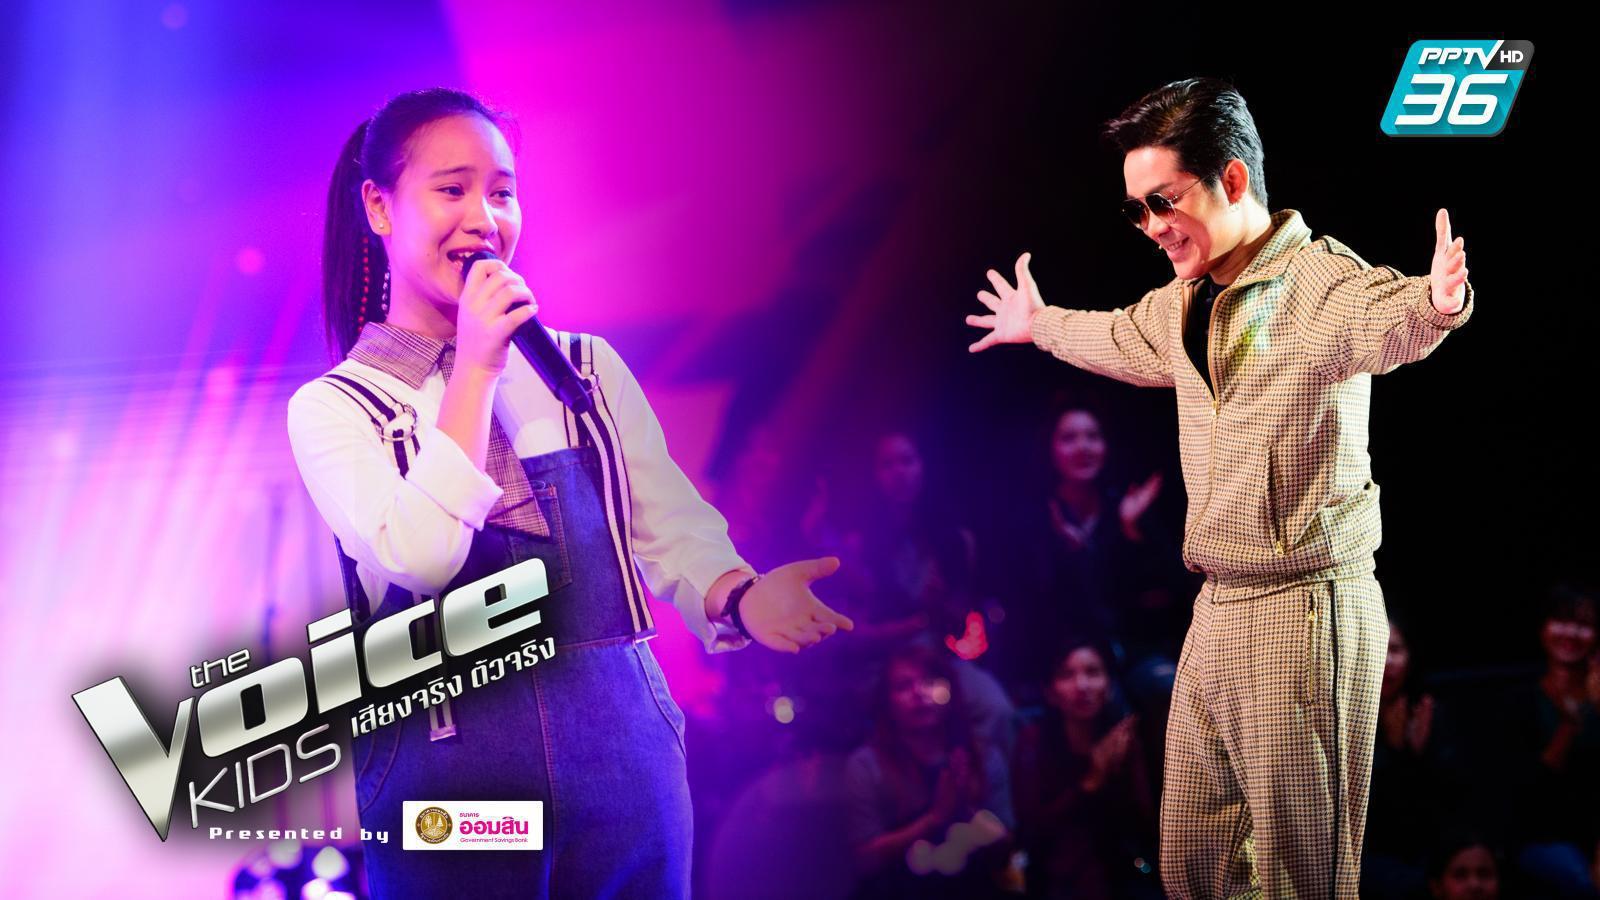 The Voice Kids 2020 | Blind Auditions ครั้งที่5 | ตำนานเพลงรักสดใส สไตล์ลูกกรุงไร้ที่ติ!